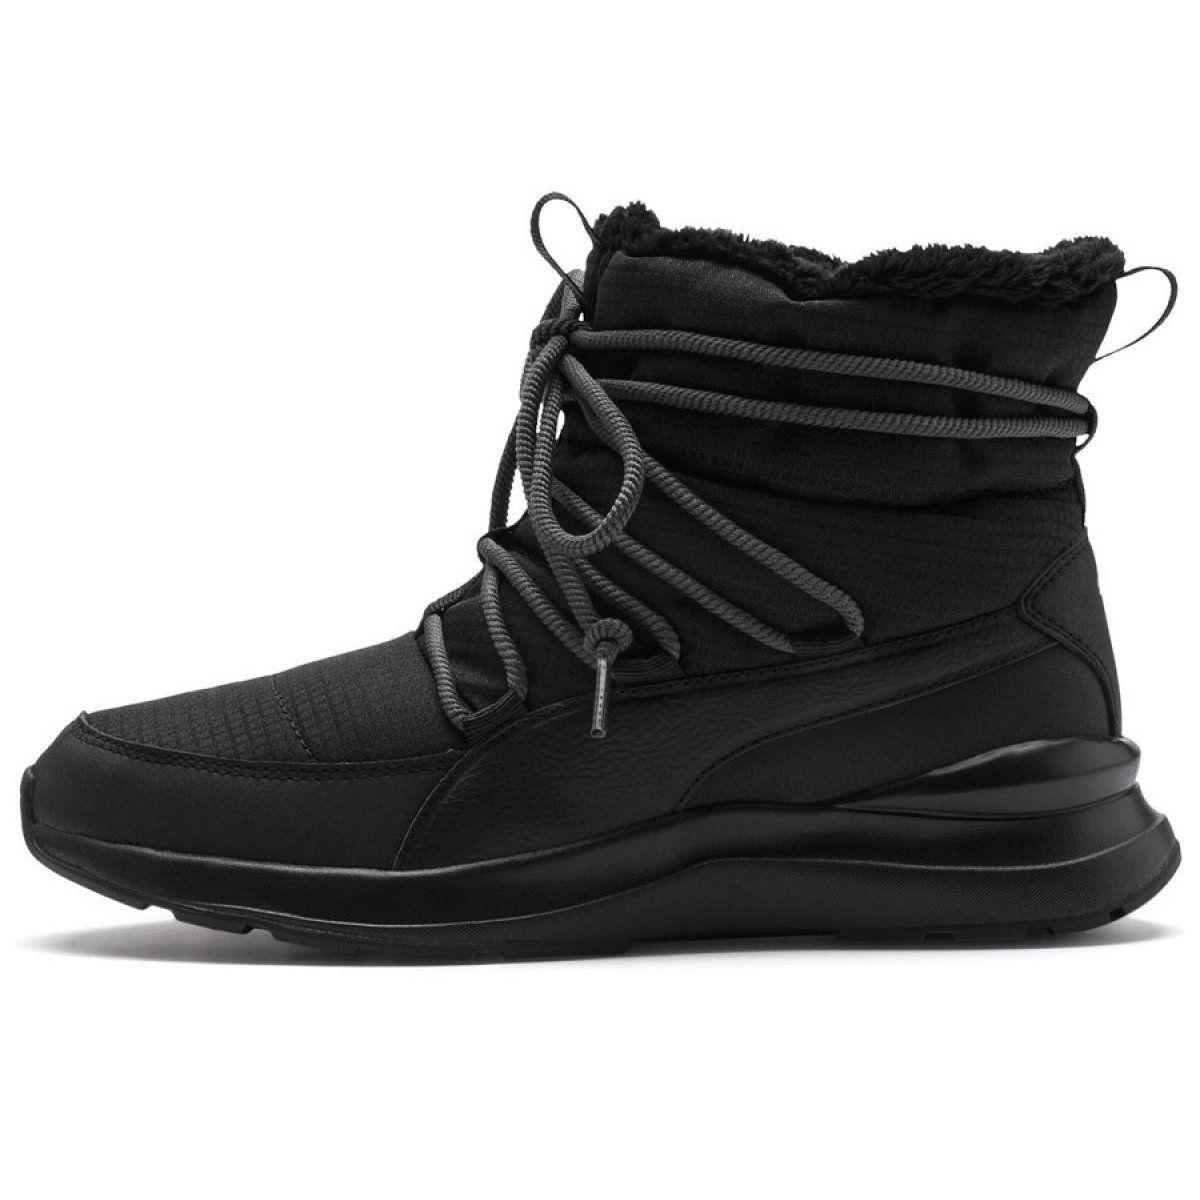 Buty Puma Adela Winter Boot W 369862 01 Czarne Winter Shoes For Women Puma Shoes Women Black Shoes